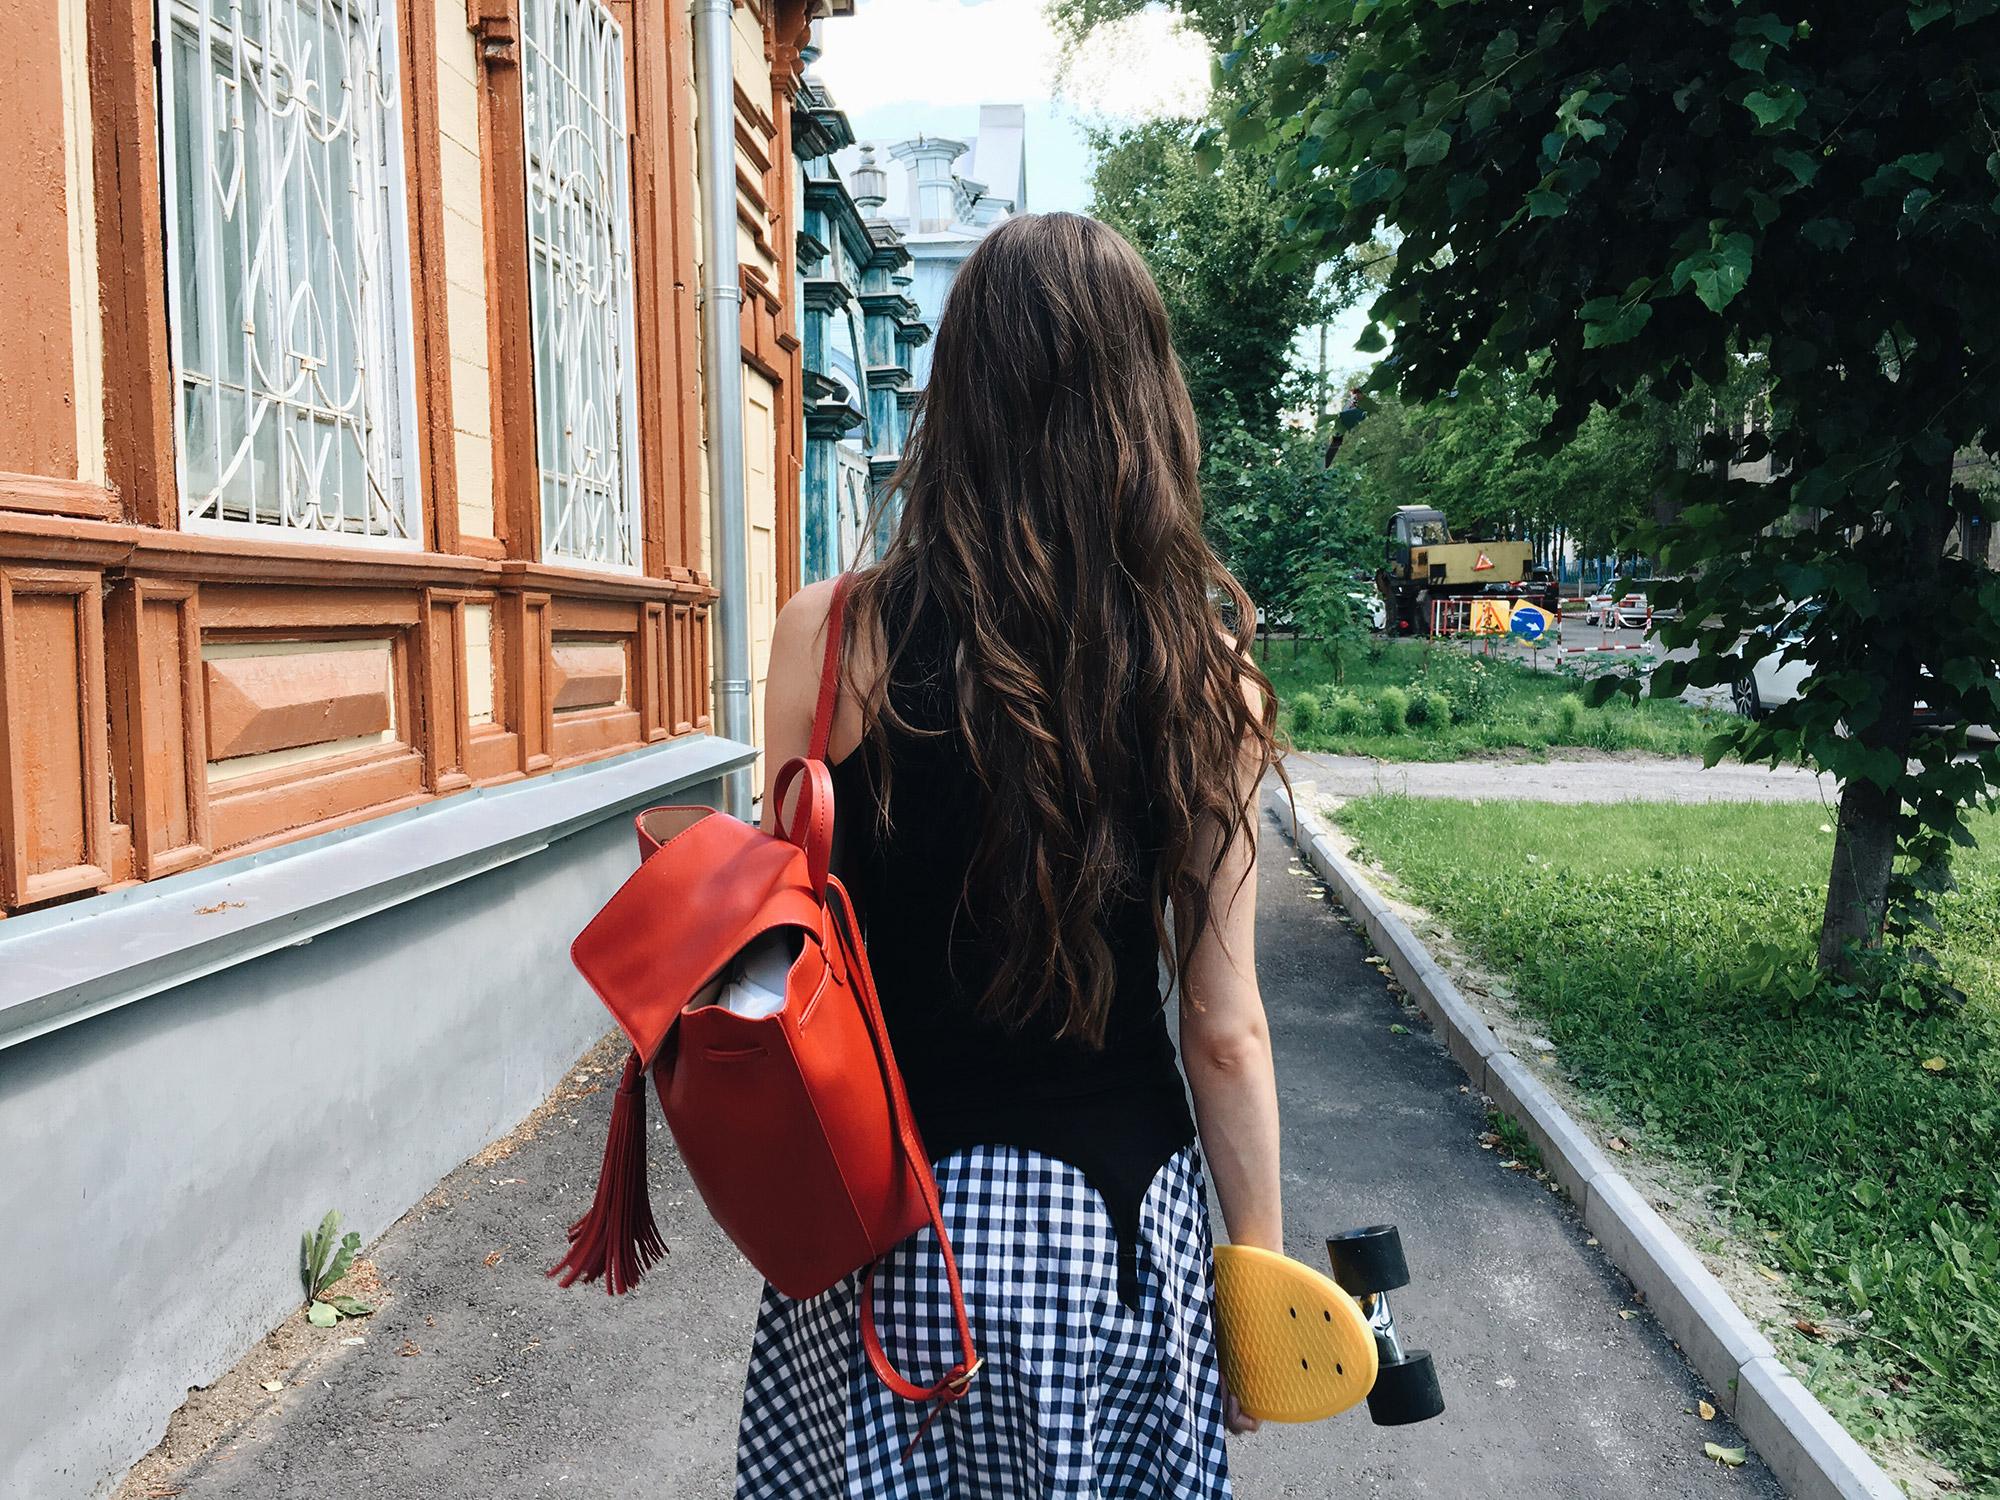 Lingerie as outerwear. Kriss Soonik suspender top. Indie photographer: Irina Amosova. Hairstyle: Nadezhda Valiulina